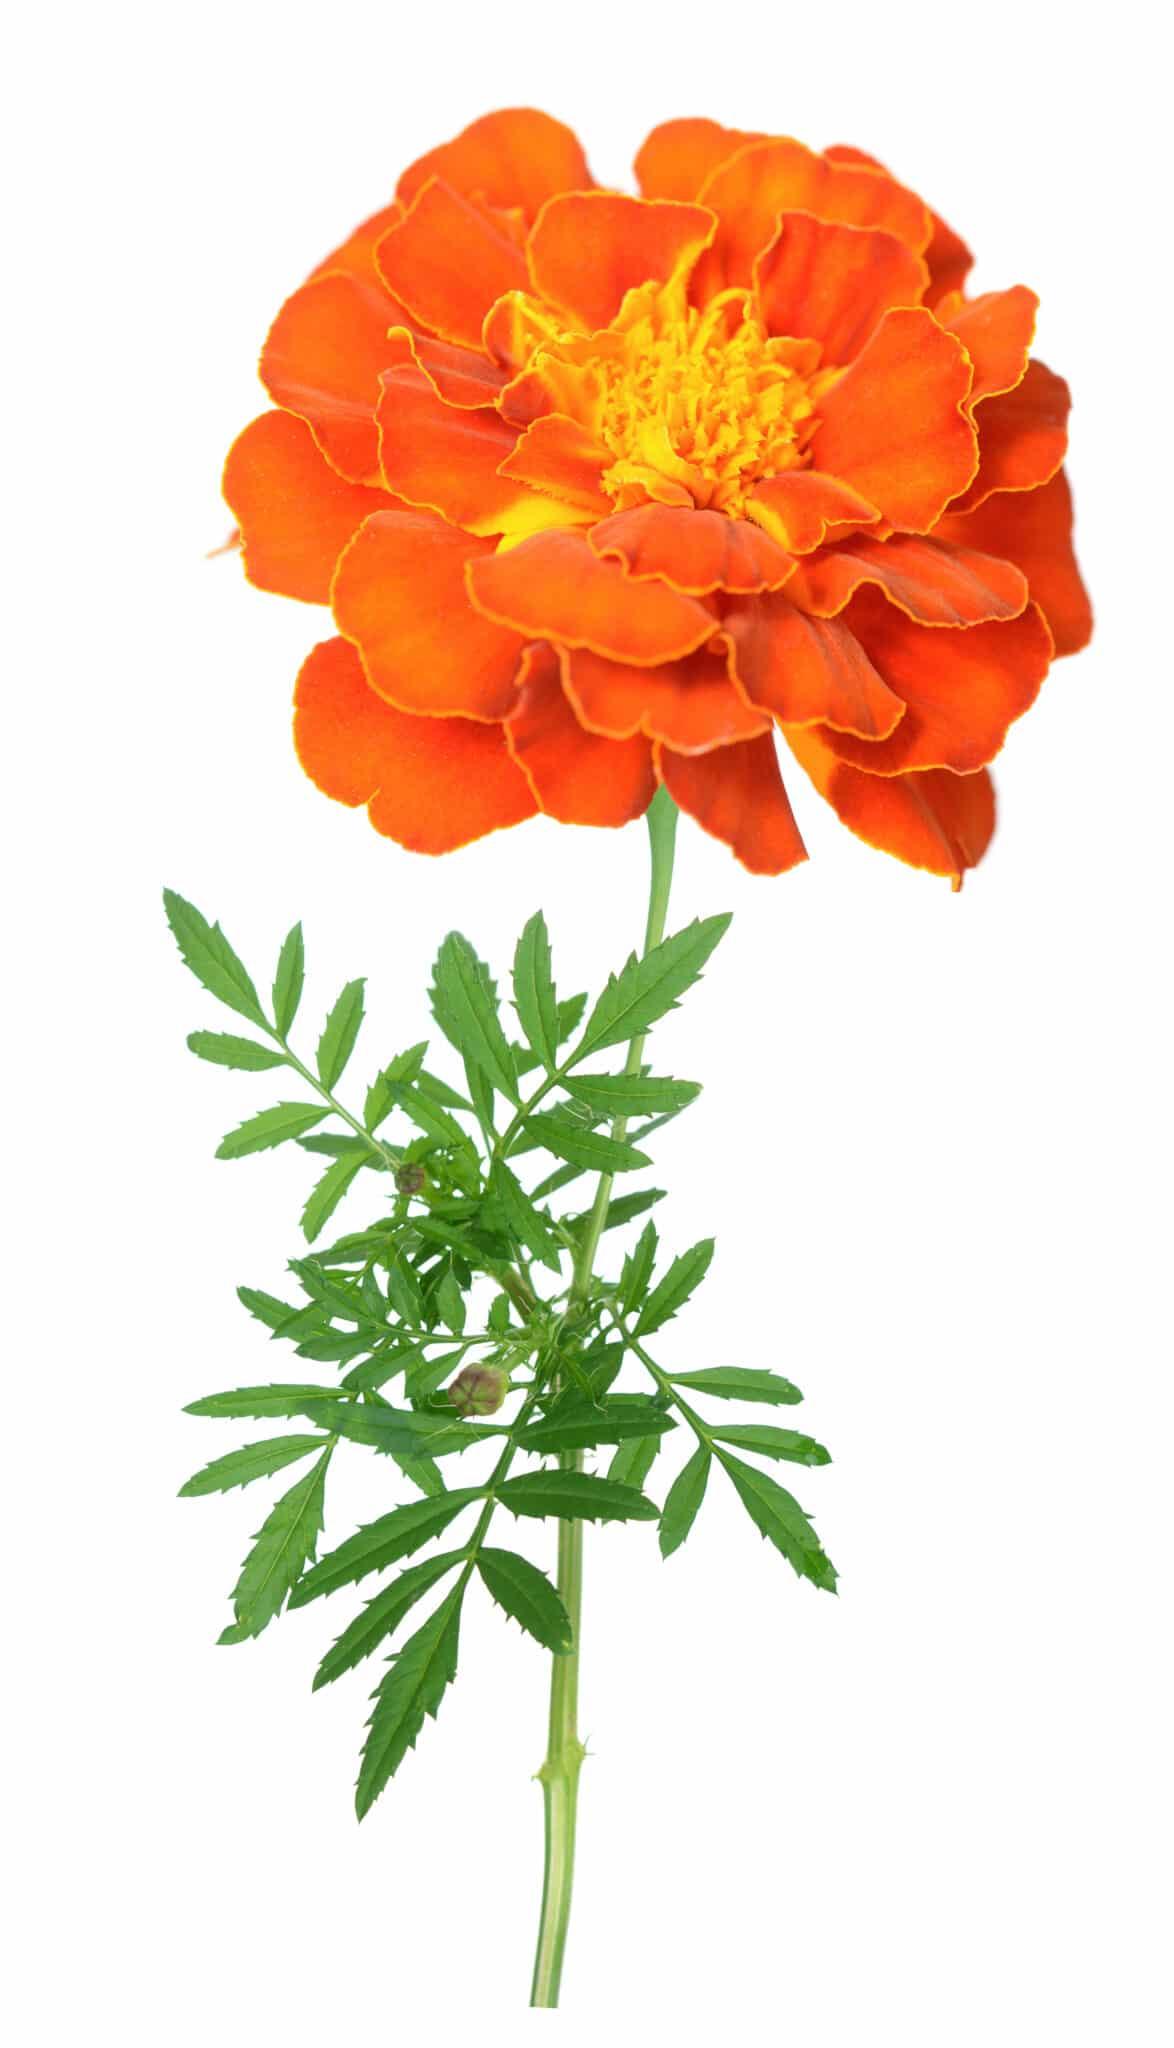 Bright orange ruffled petal marigold flower against a bright white background.